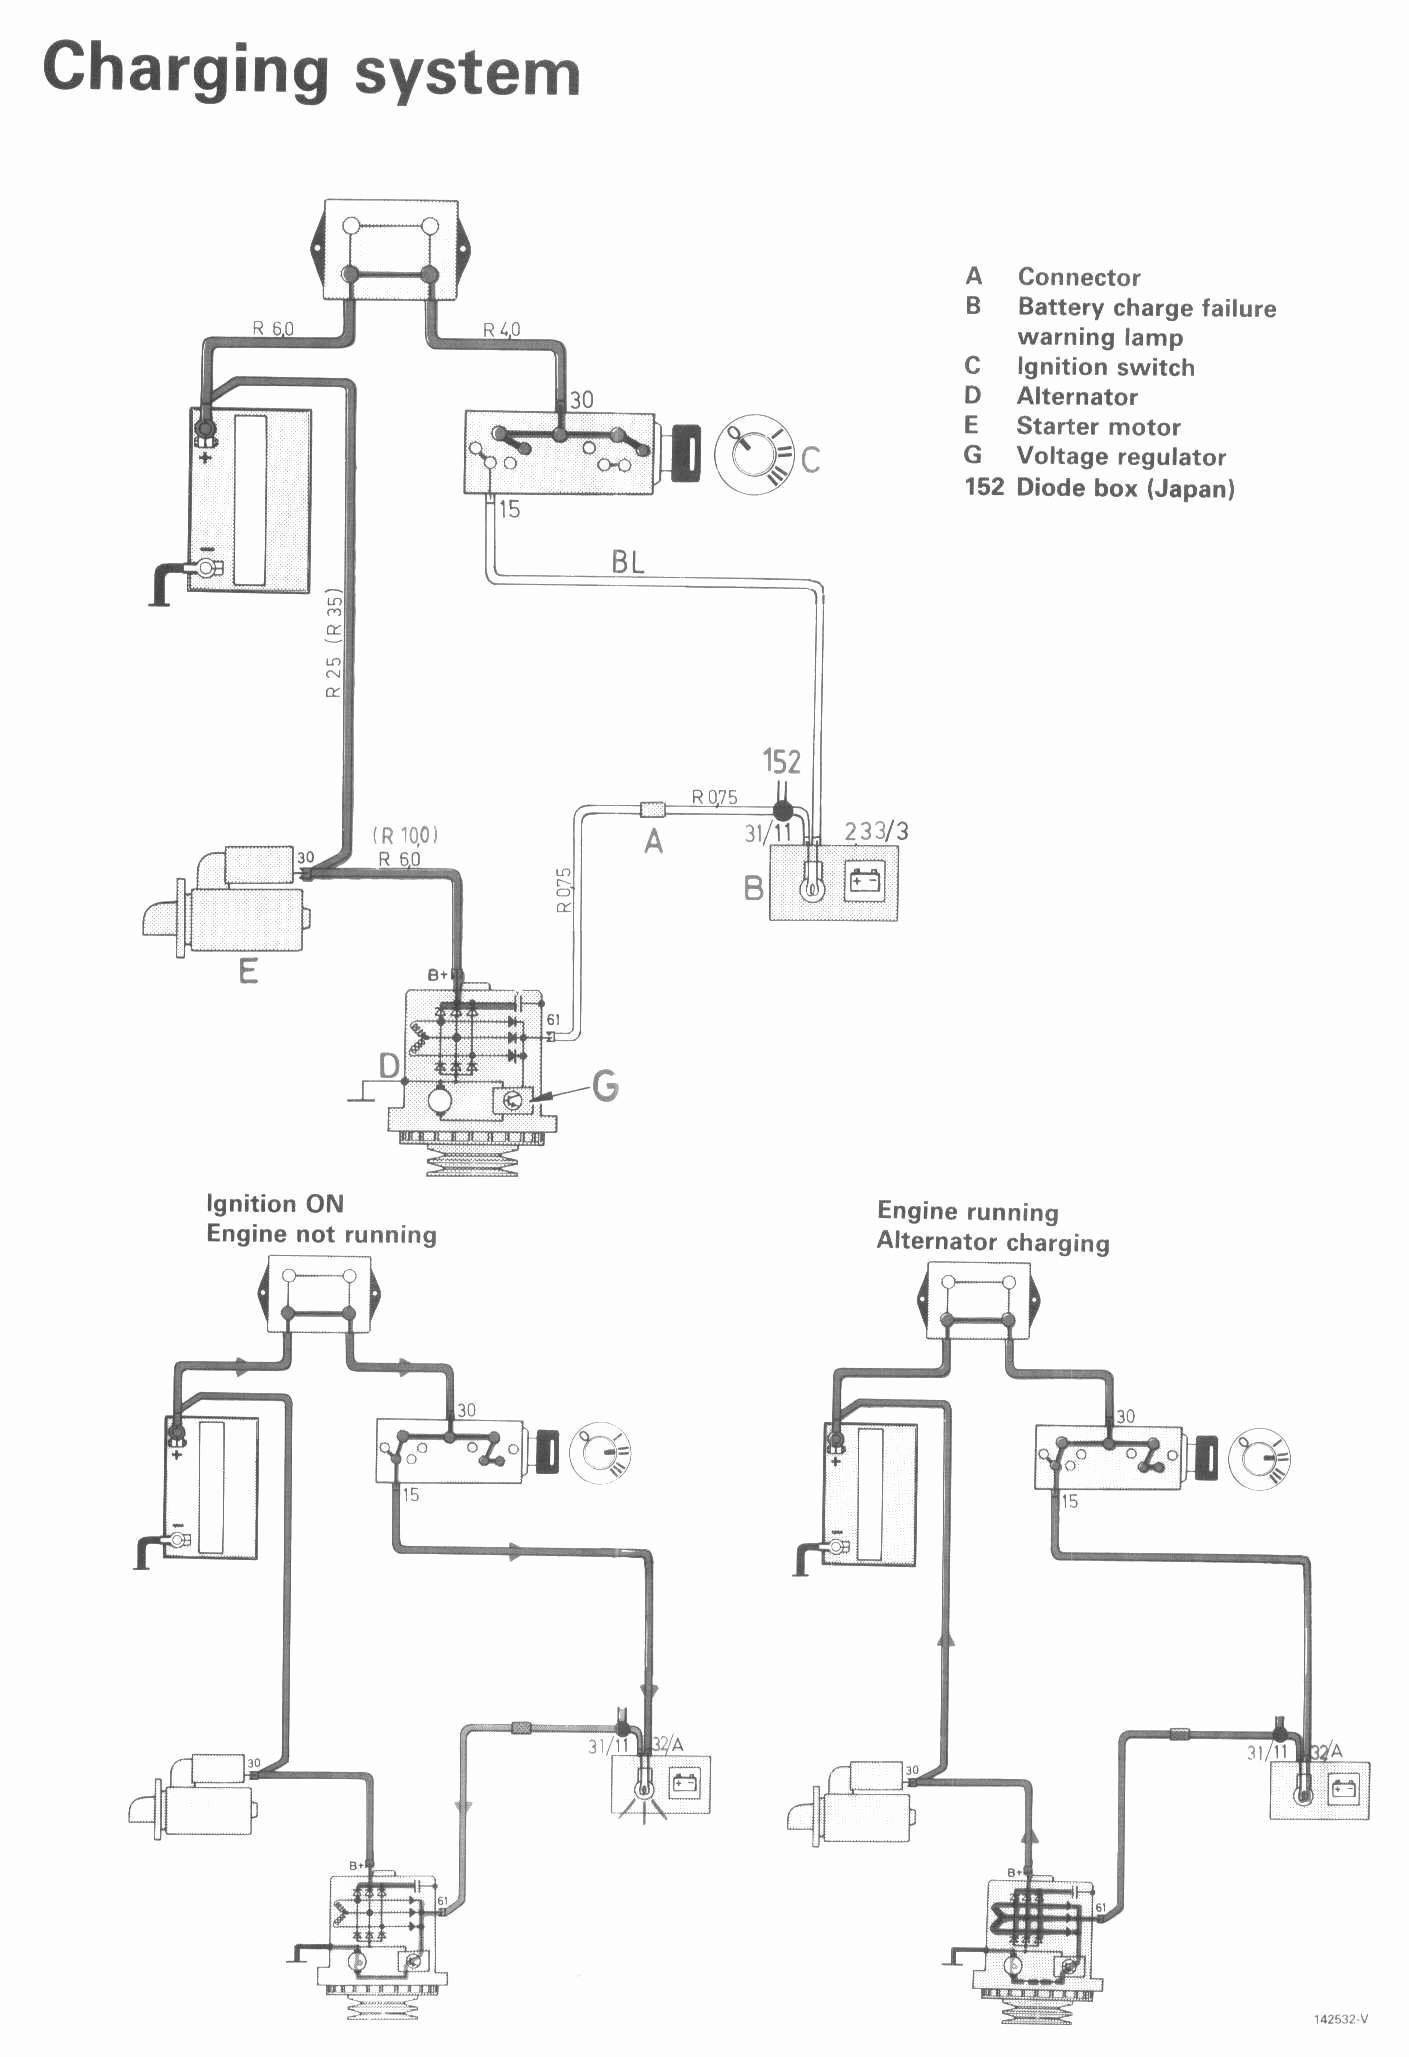 √ volvo alternator wiring diagram 24 volt jasco alternator wiring Volvo 740 Wiring Diagram